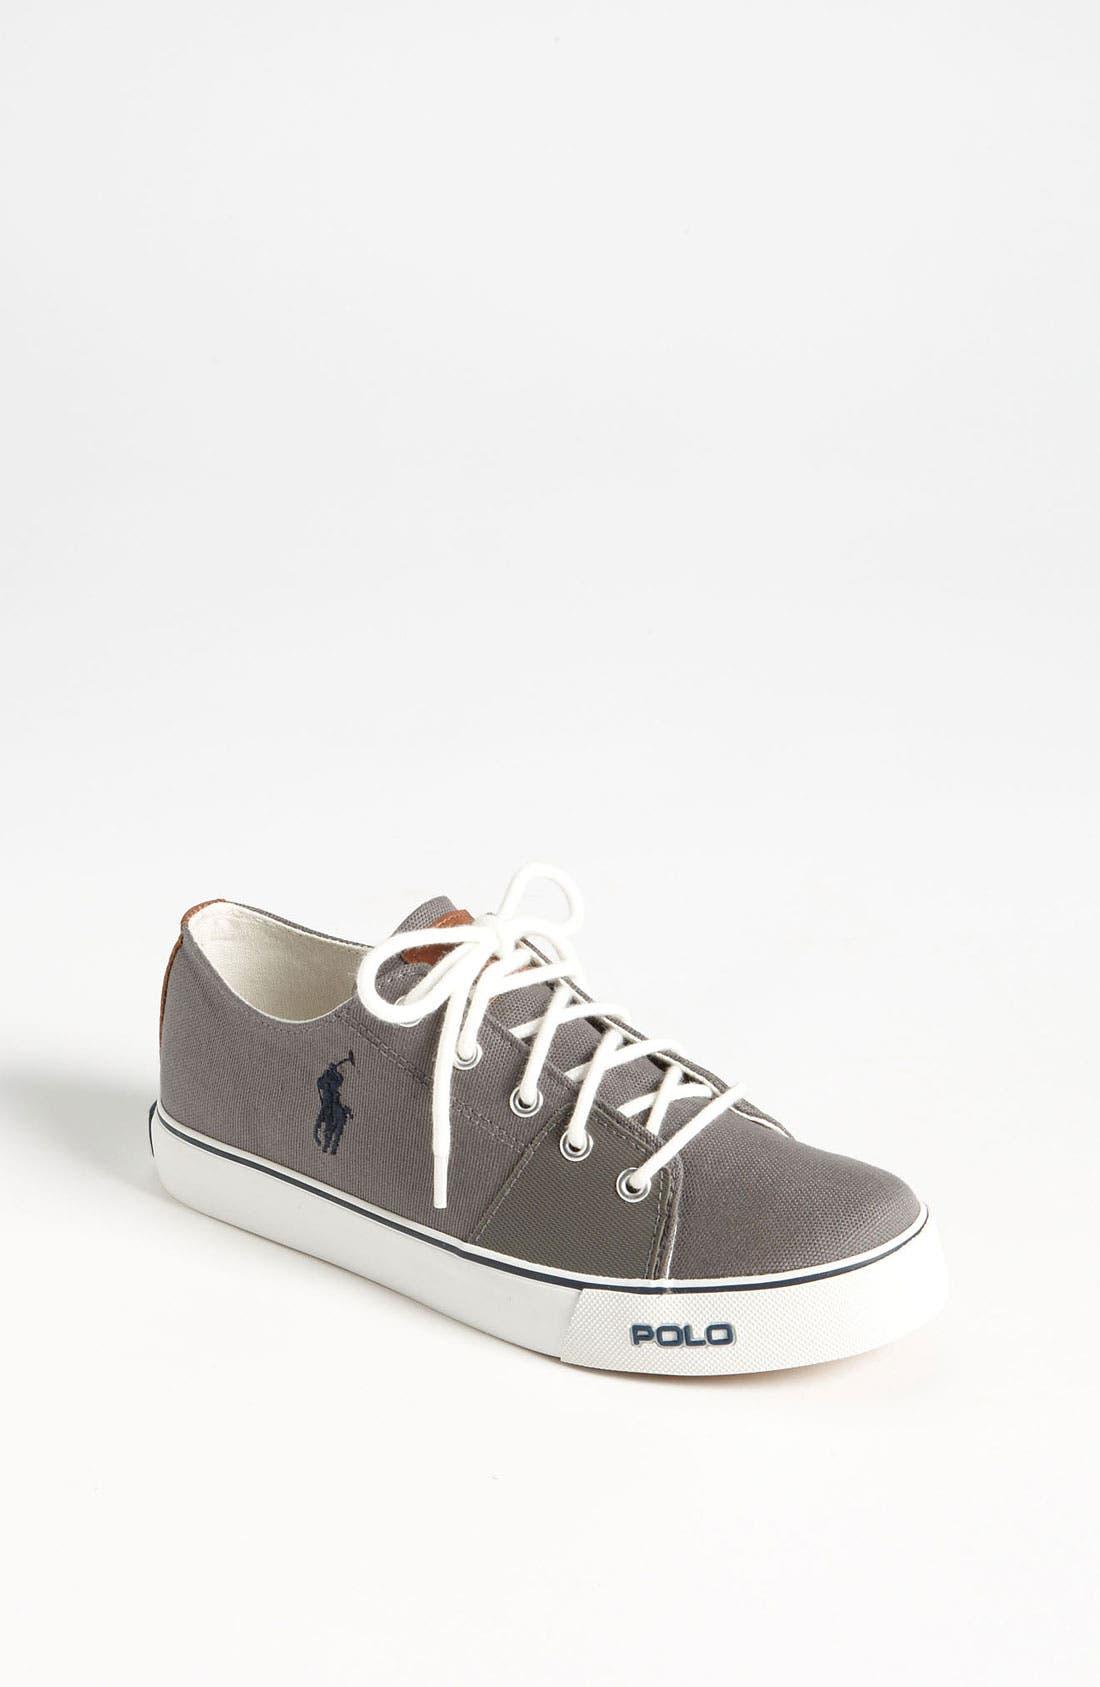 Alternate Image 1 Selected - Ralph Lauren Sneaker (Toddler, Little Kid & Big Kid)